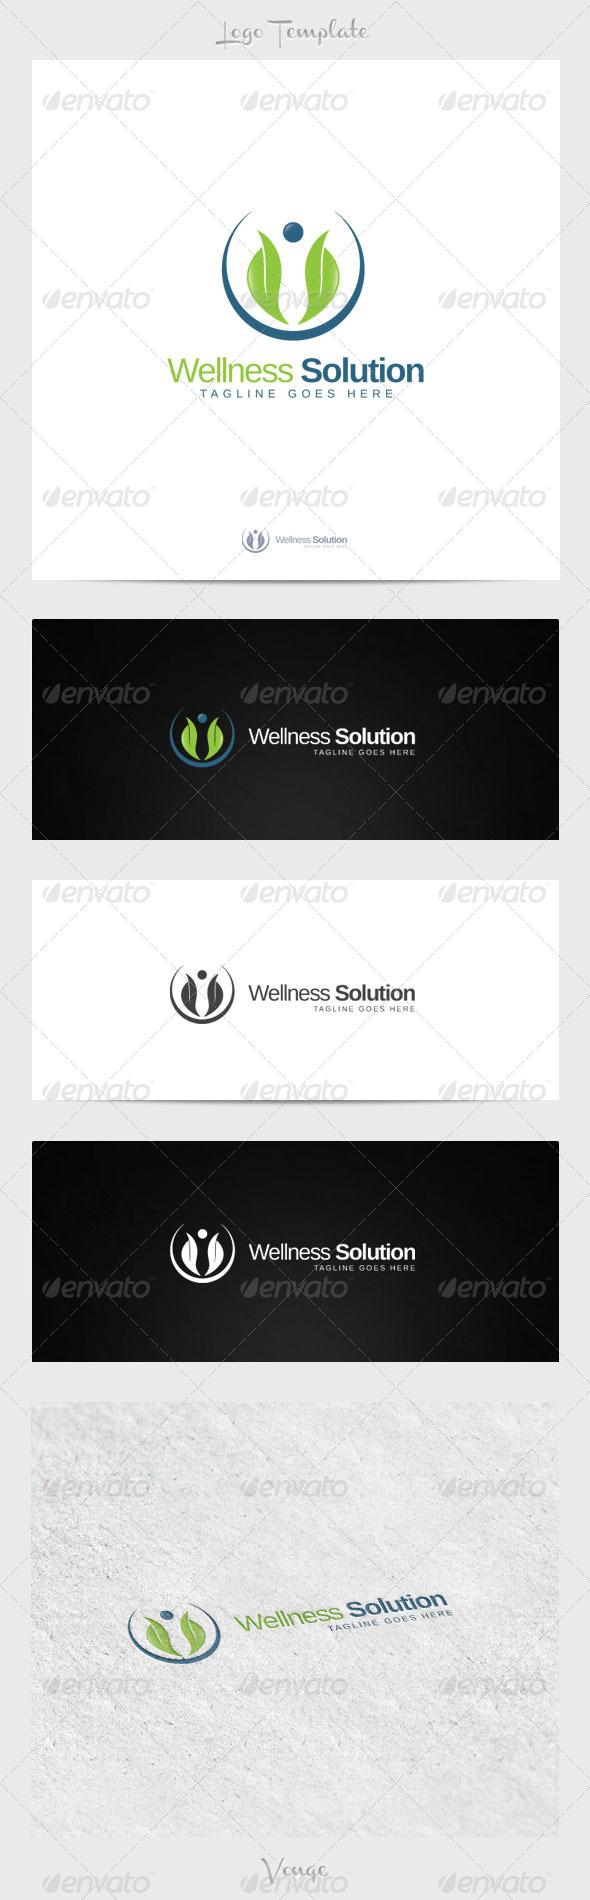 GraphicRiver Wellness Solutions 4222968